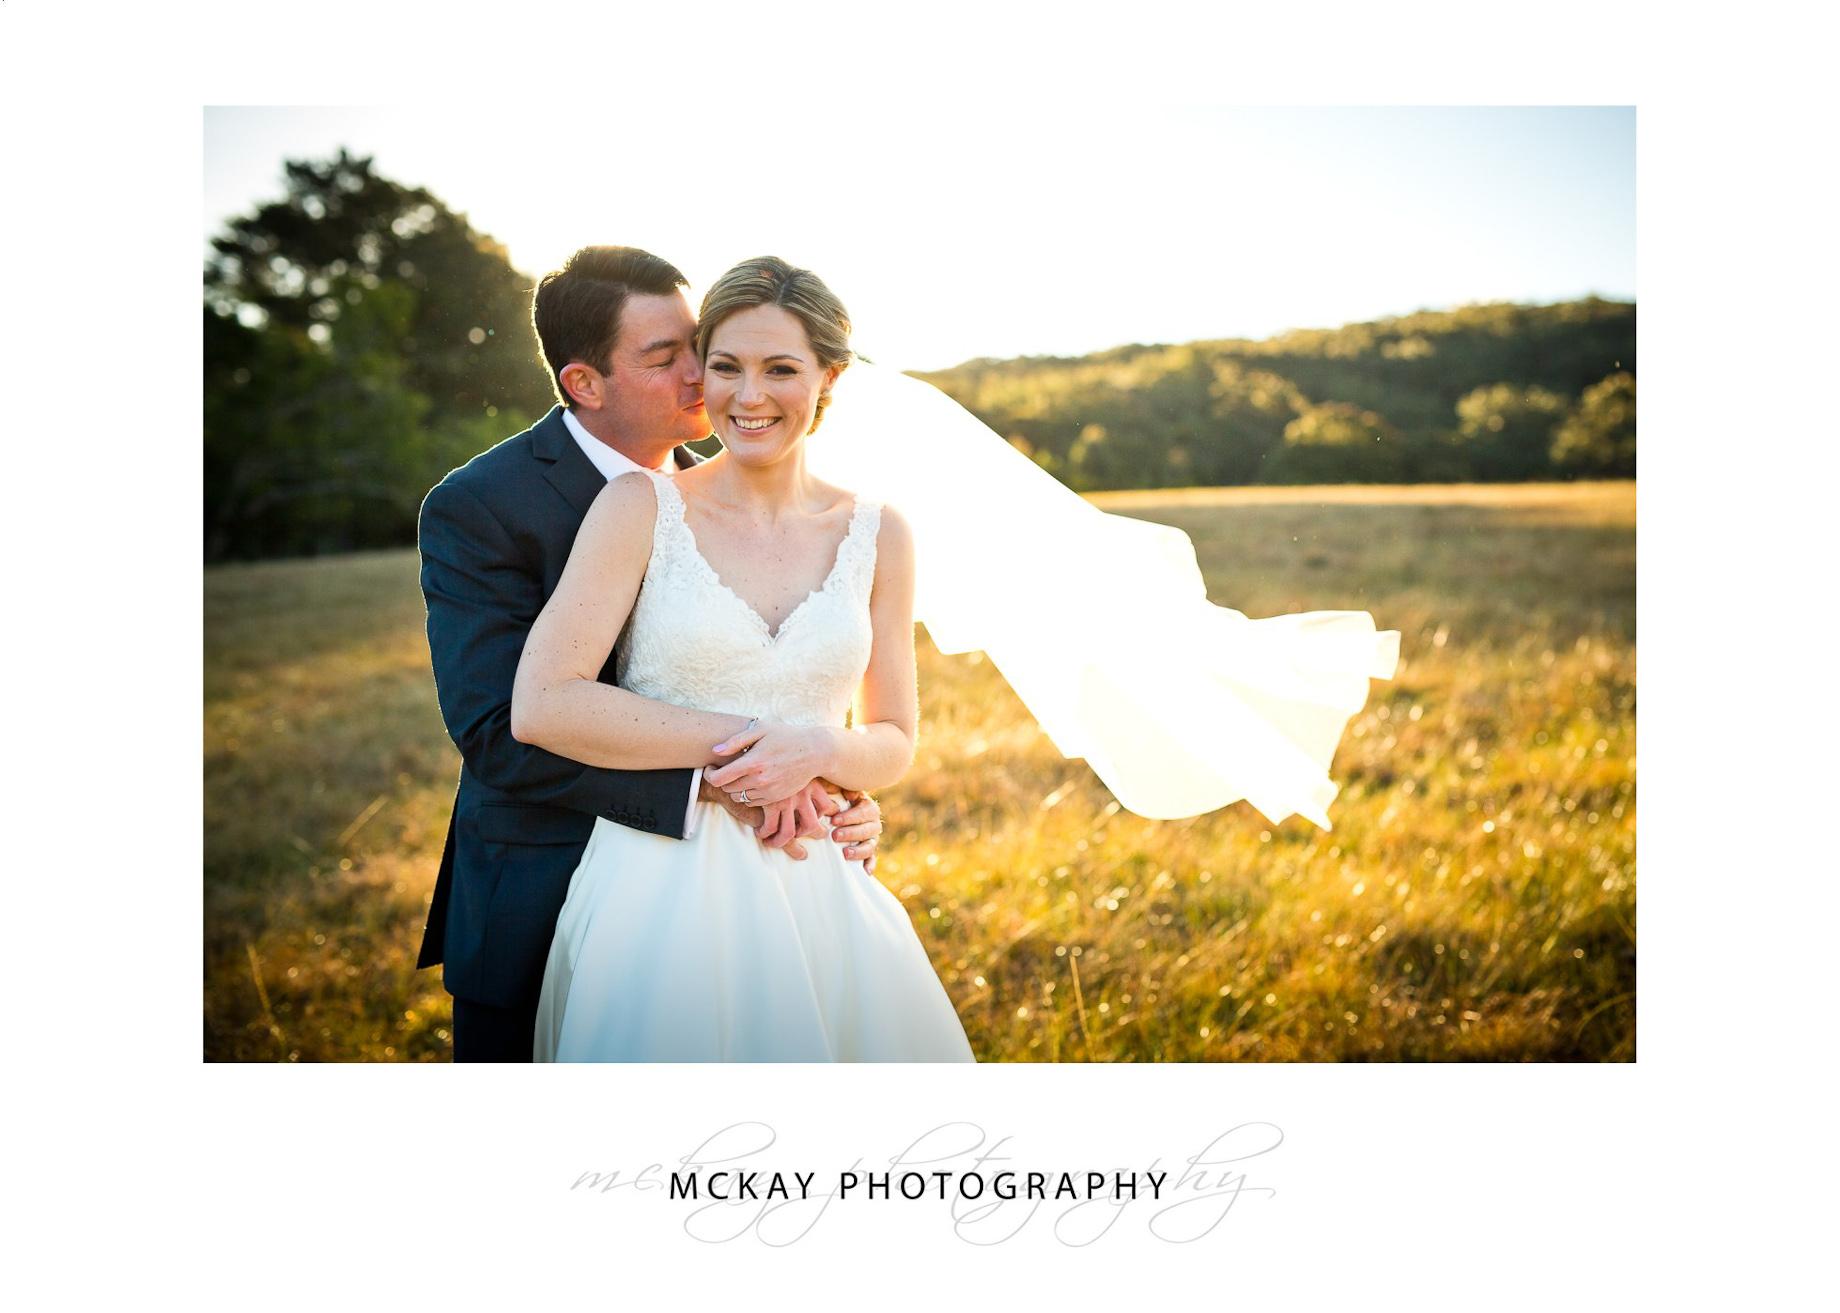 Bride groom grass field Bowral wedding photo sunset